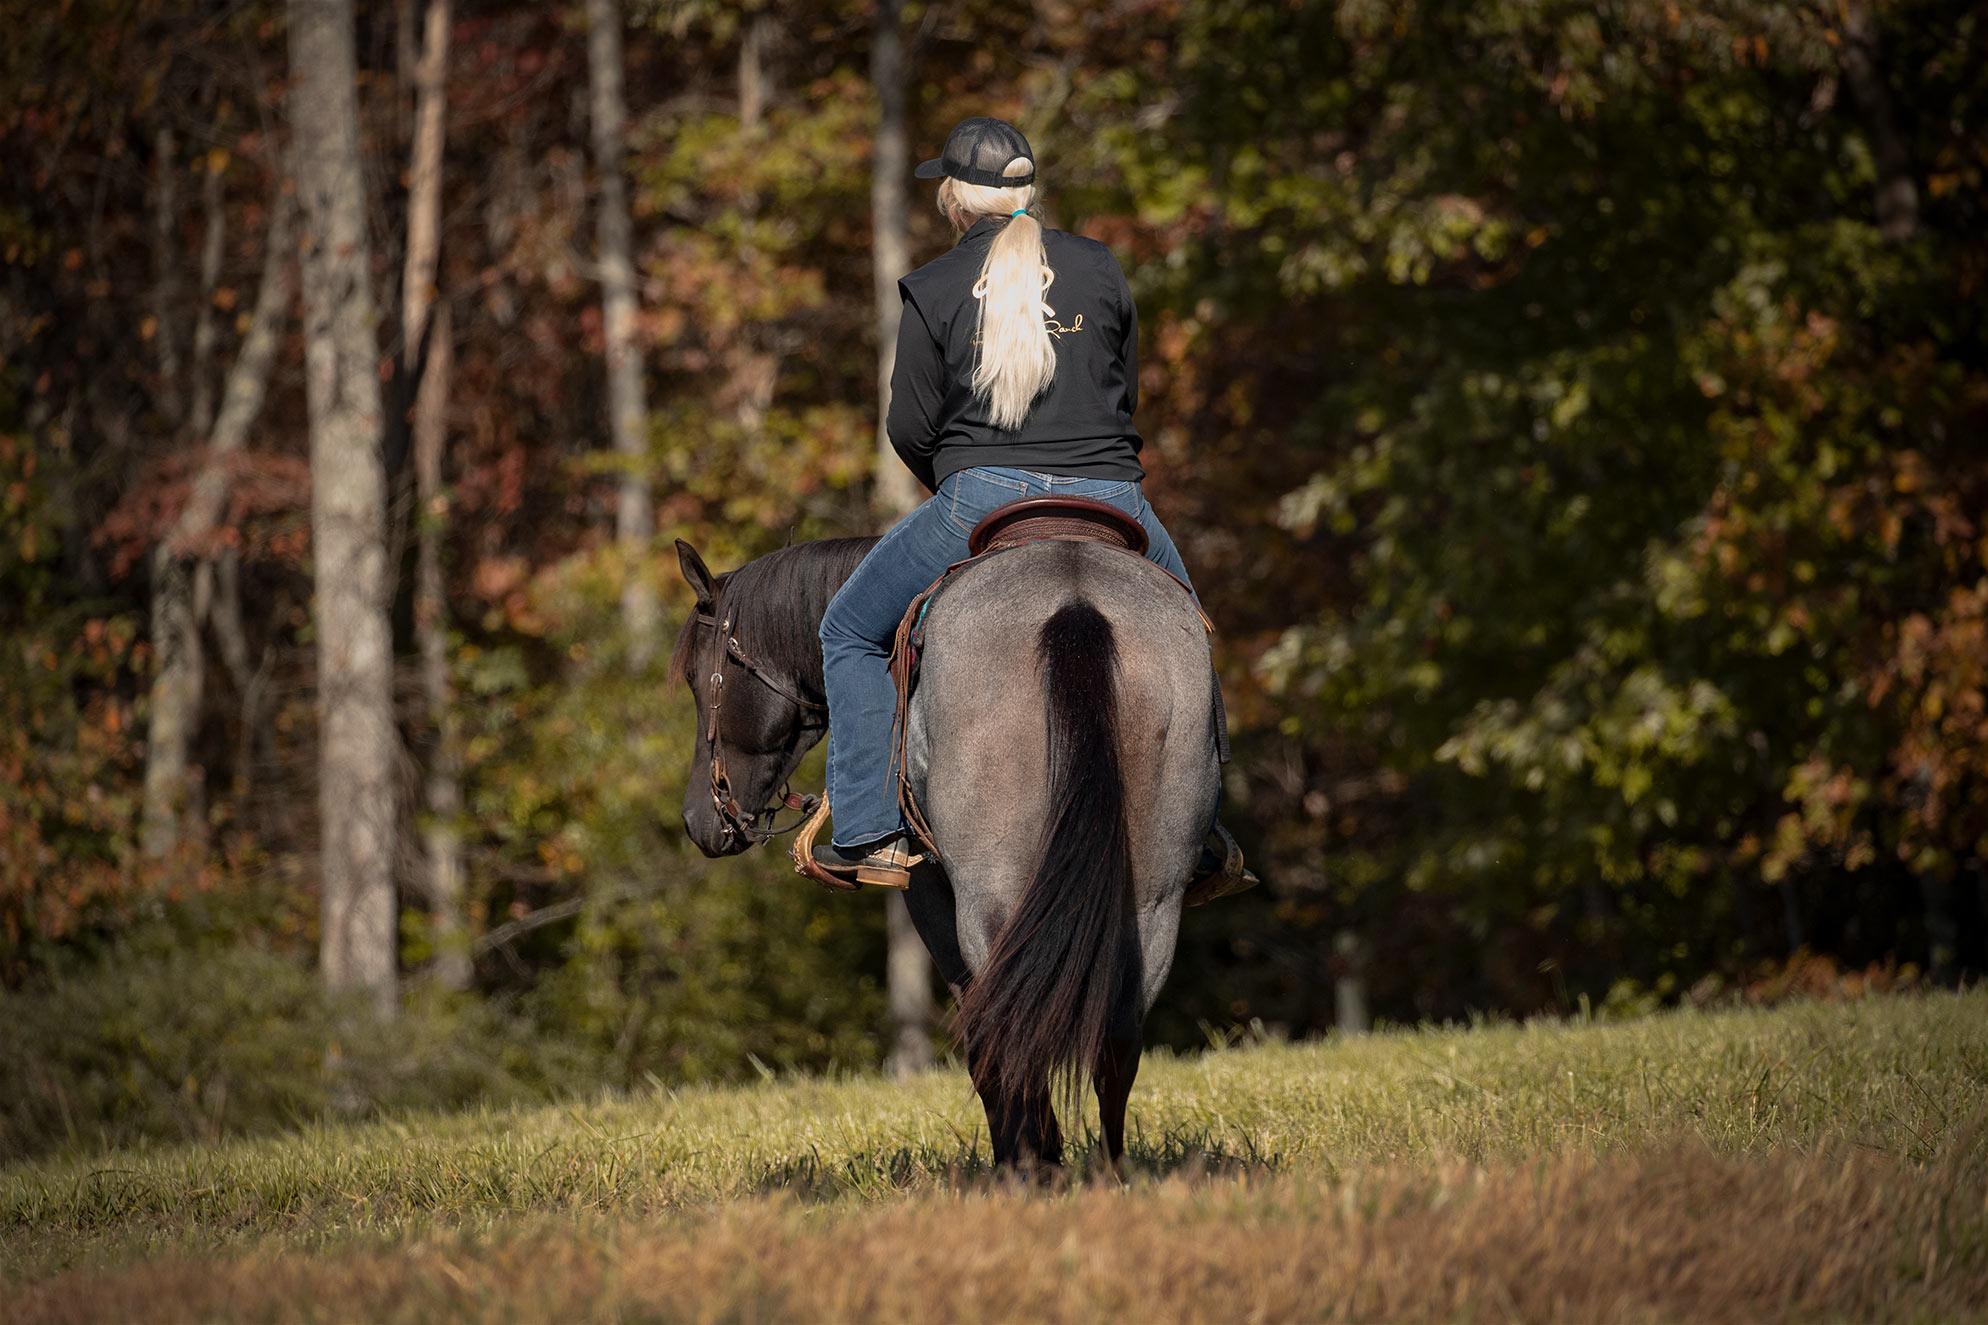 012-Gunsmoke-Luxury-Trail-Horse-For-Sale